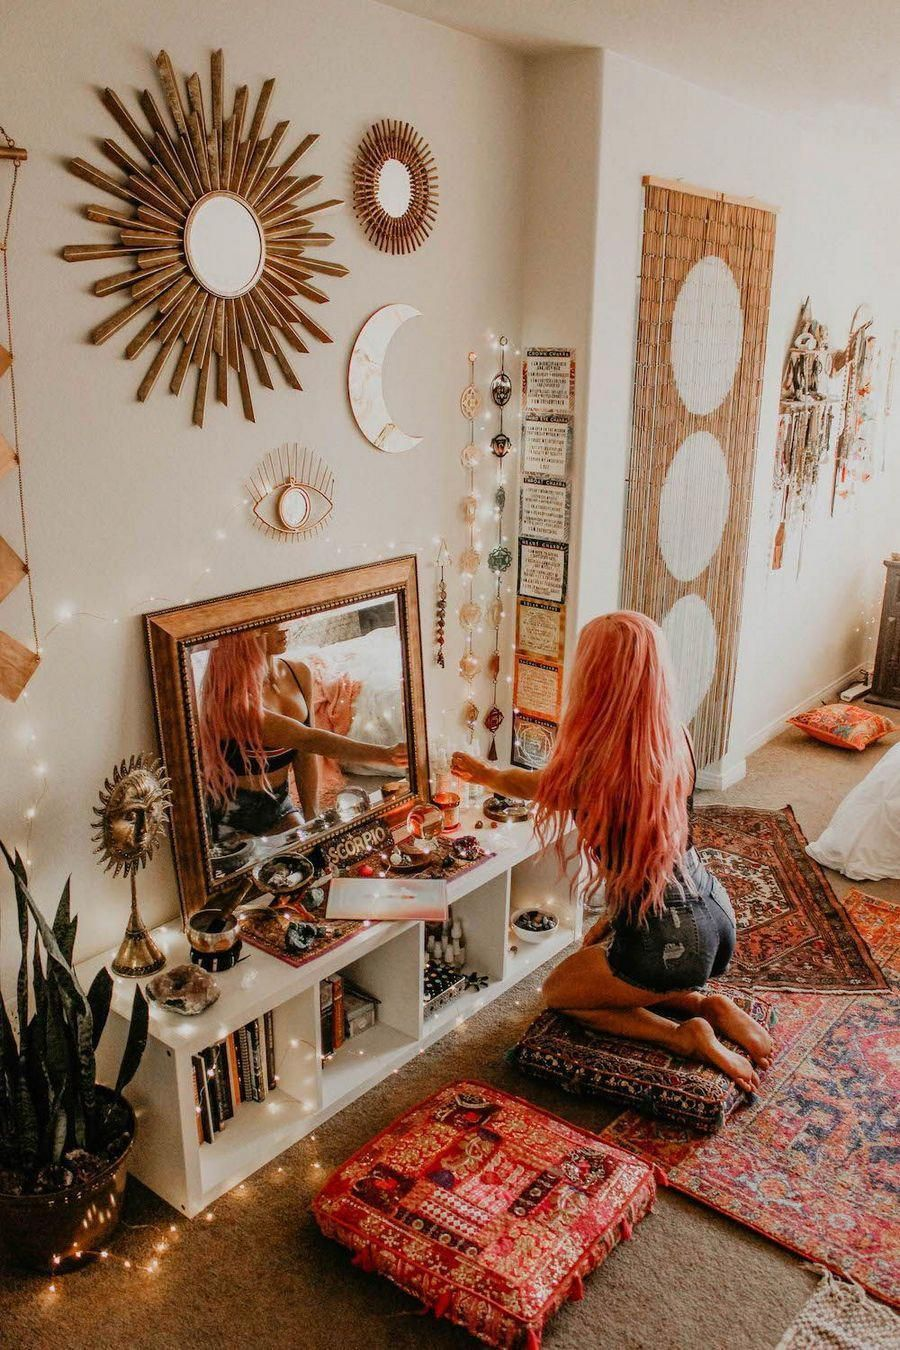 35 Beautiful Hippie Bedrooms Ideas Features Inspira Spaces Hippie Home Decor Hippy Bedroom Bohemian Bedroom Decor Hippie bedroom decor ideas